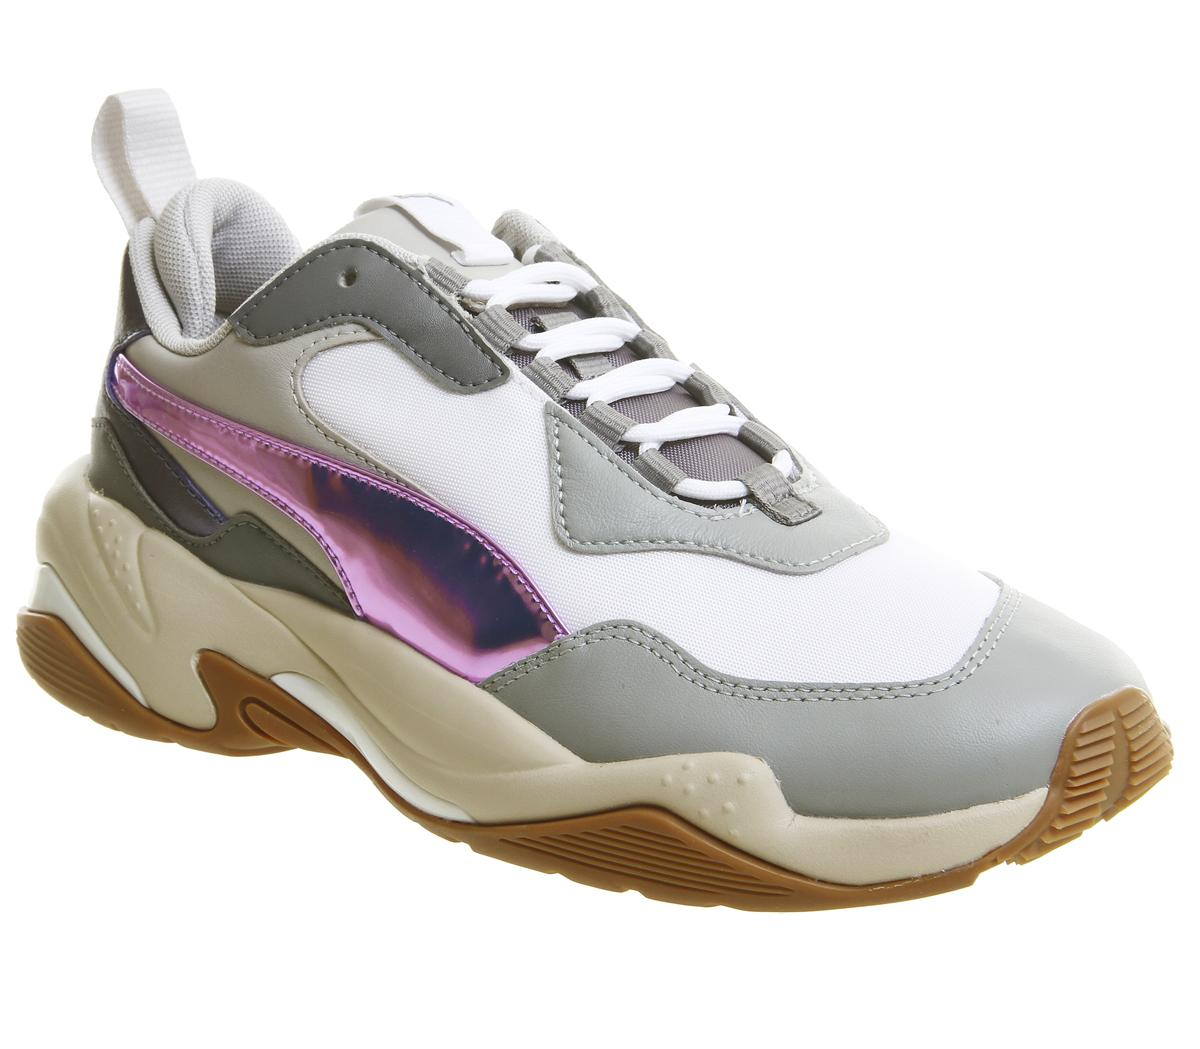 Puma Thunder Electric Lavender Sneakers | ASOS